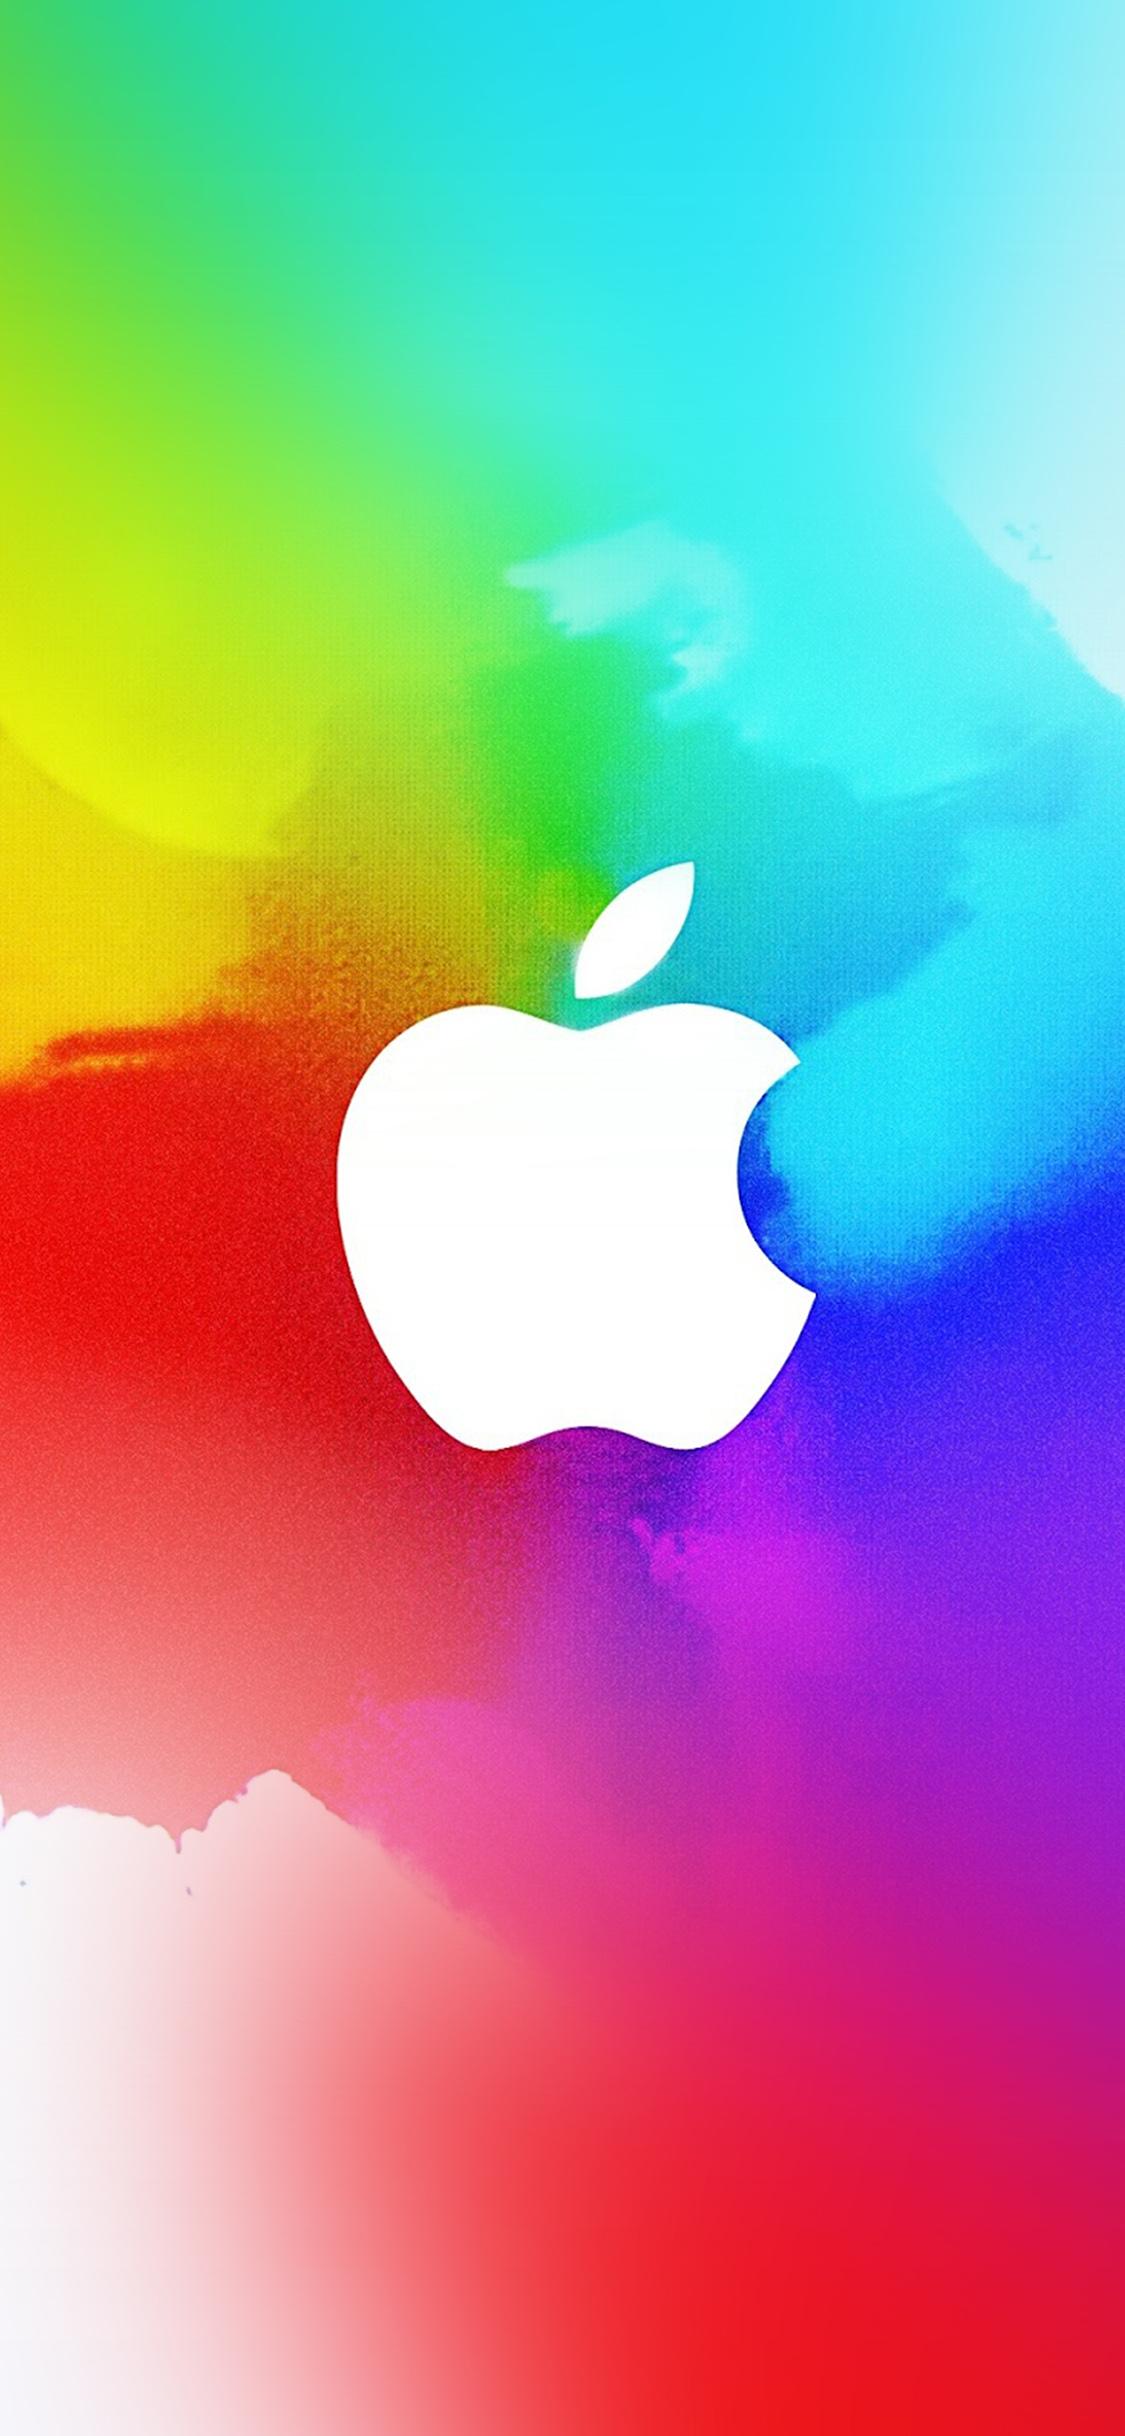 Disney Iphone Wallpaper Ay37 Apple Logo Splash Color Paint Illustration Art Wallpaper